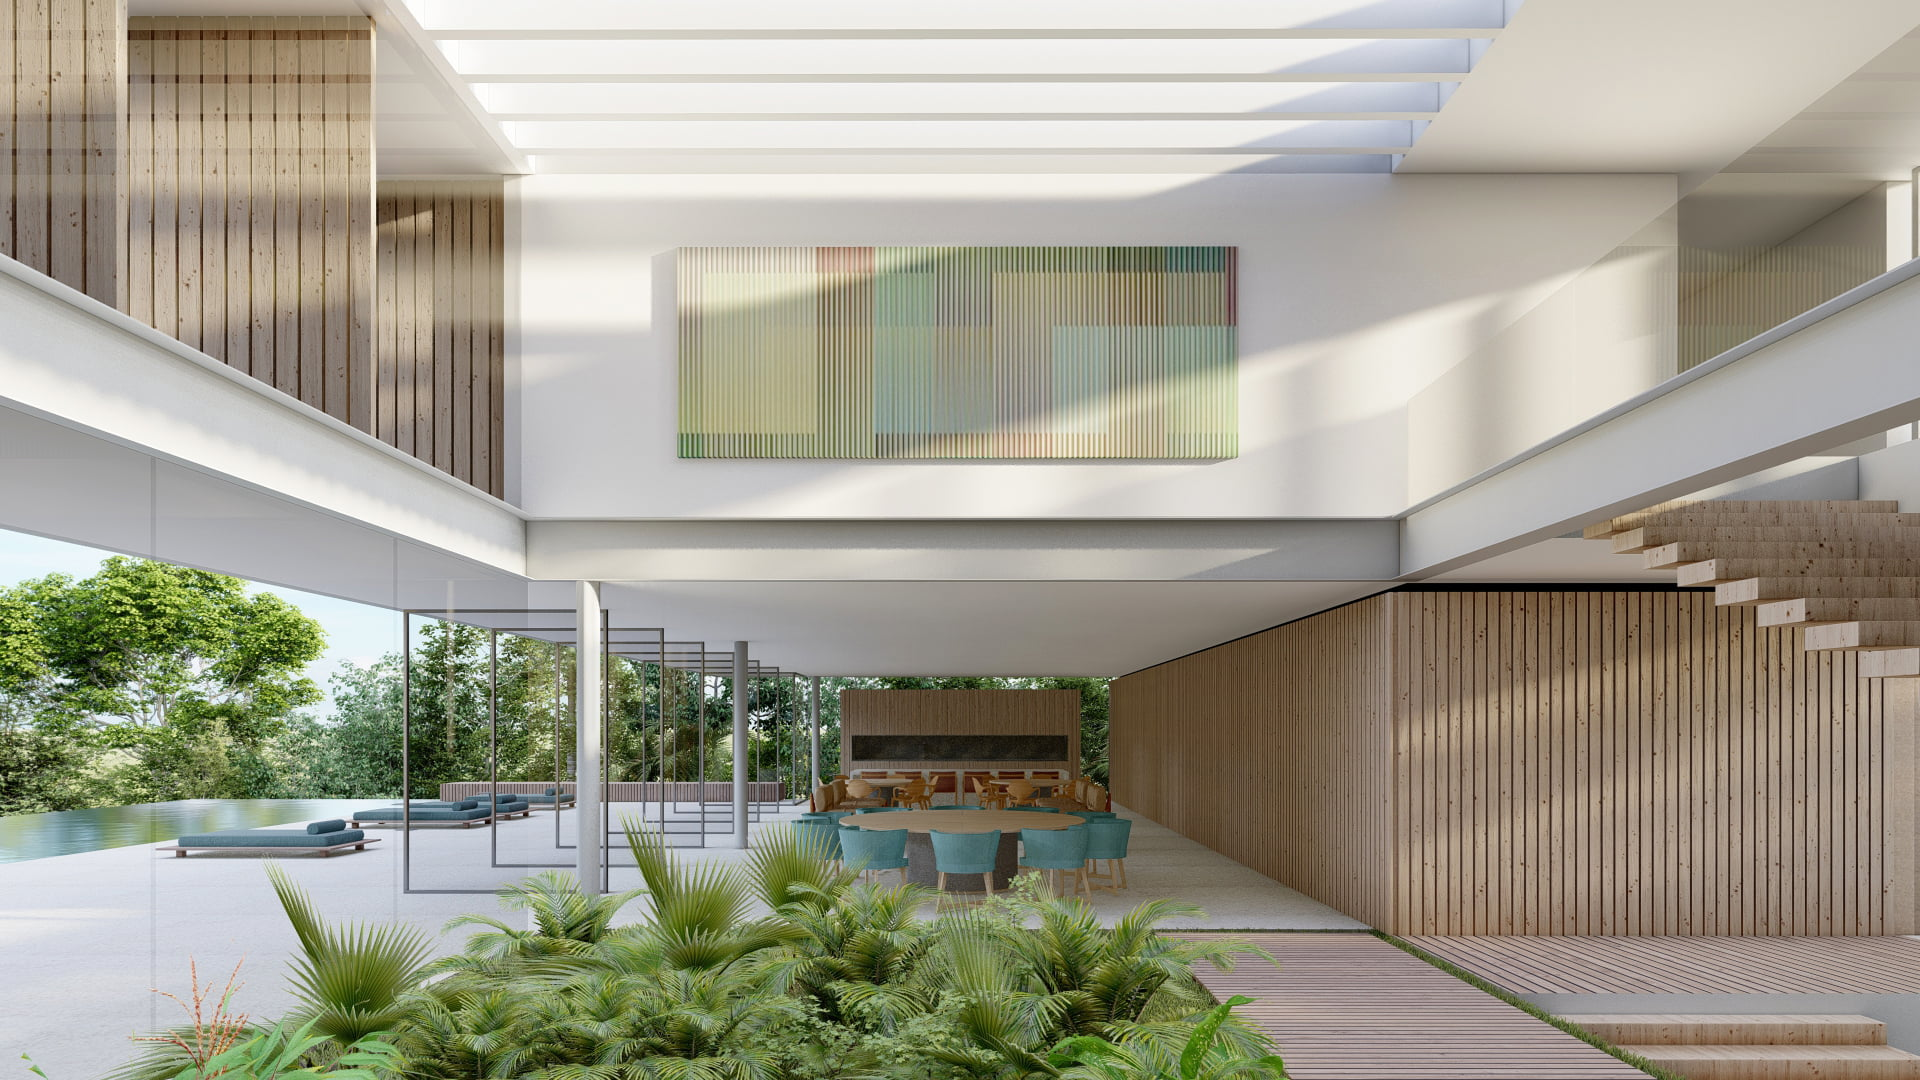 Sabella Arquitetura - Casa Branca 2